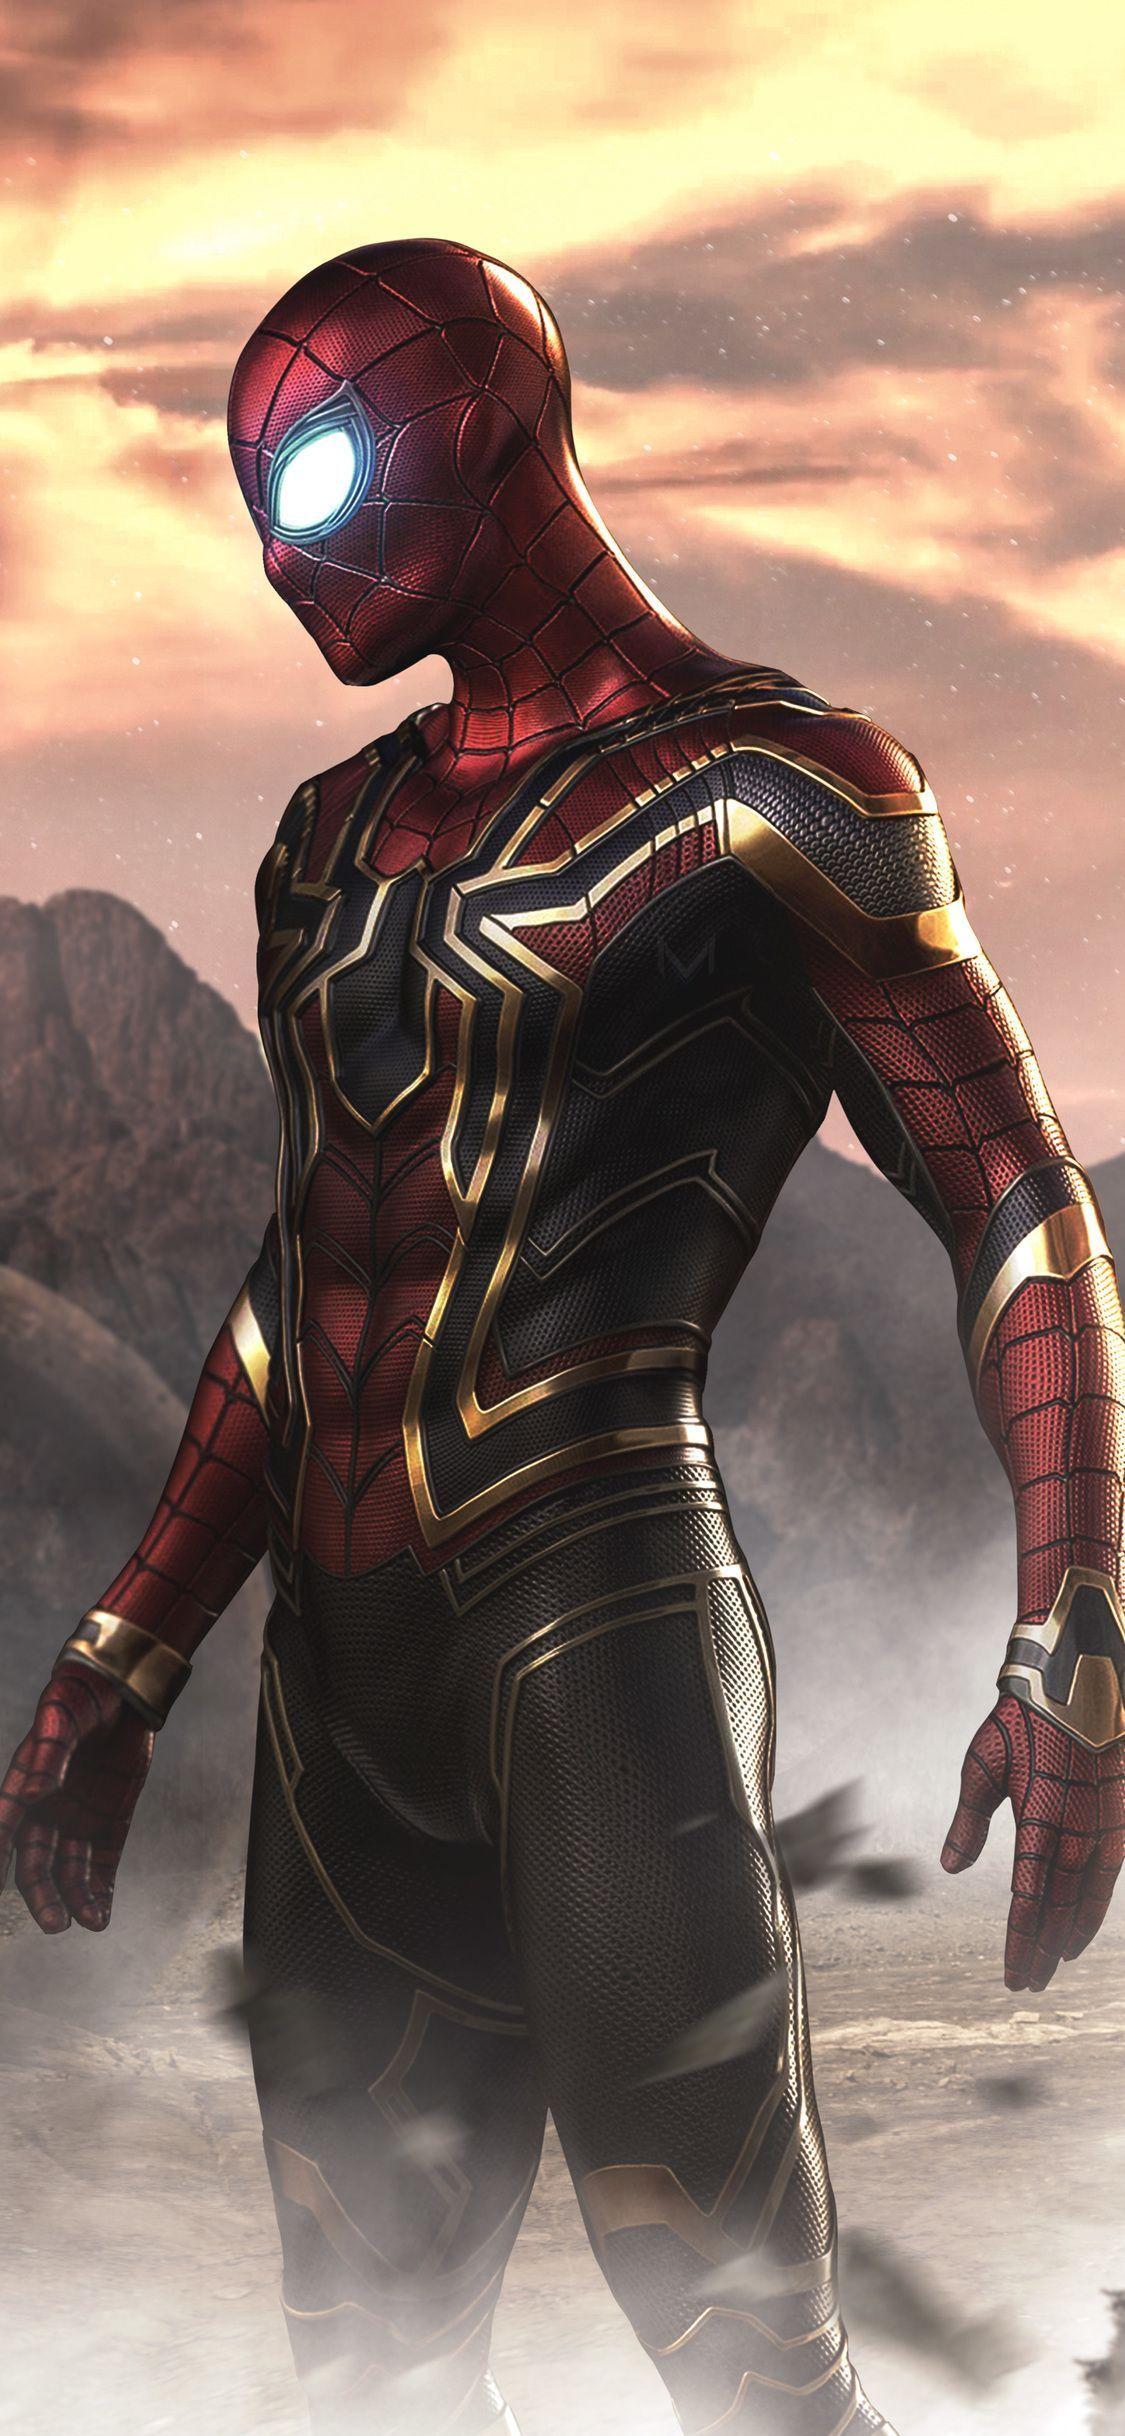 Wallpaper Spiderman Far From Home Hd Ios Or Os 2019 3d In 2020 Die Racher Spiderman Kunst Marvel Superhelden